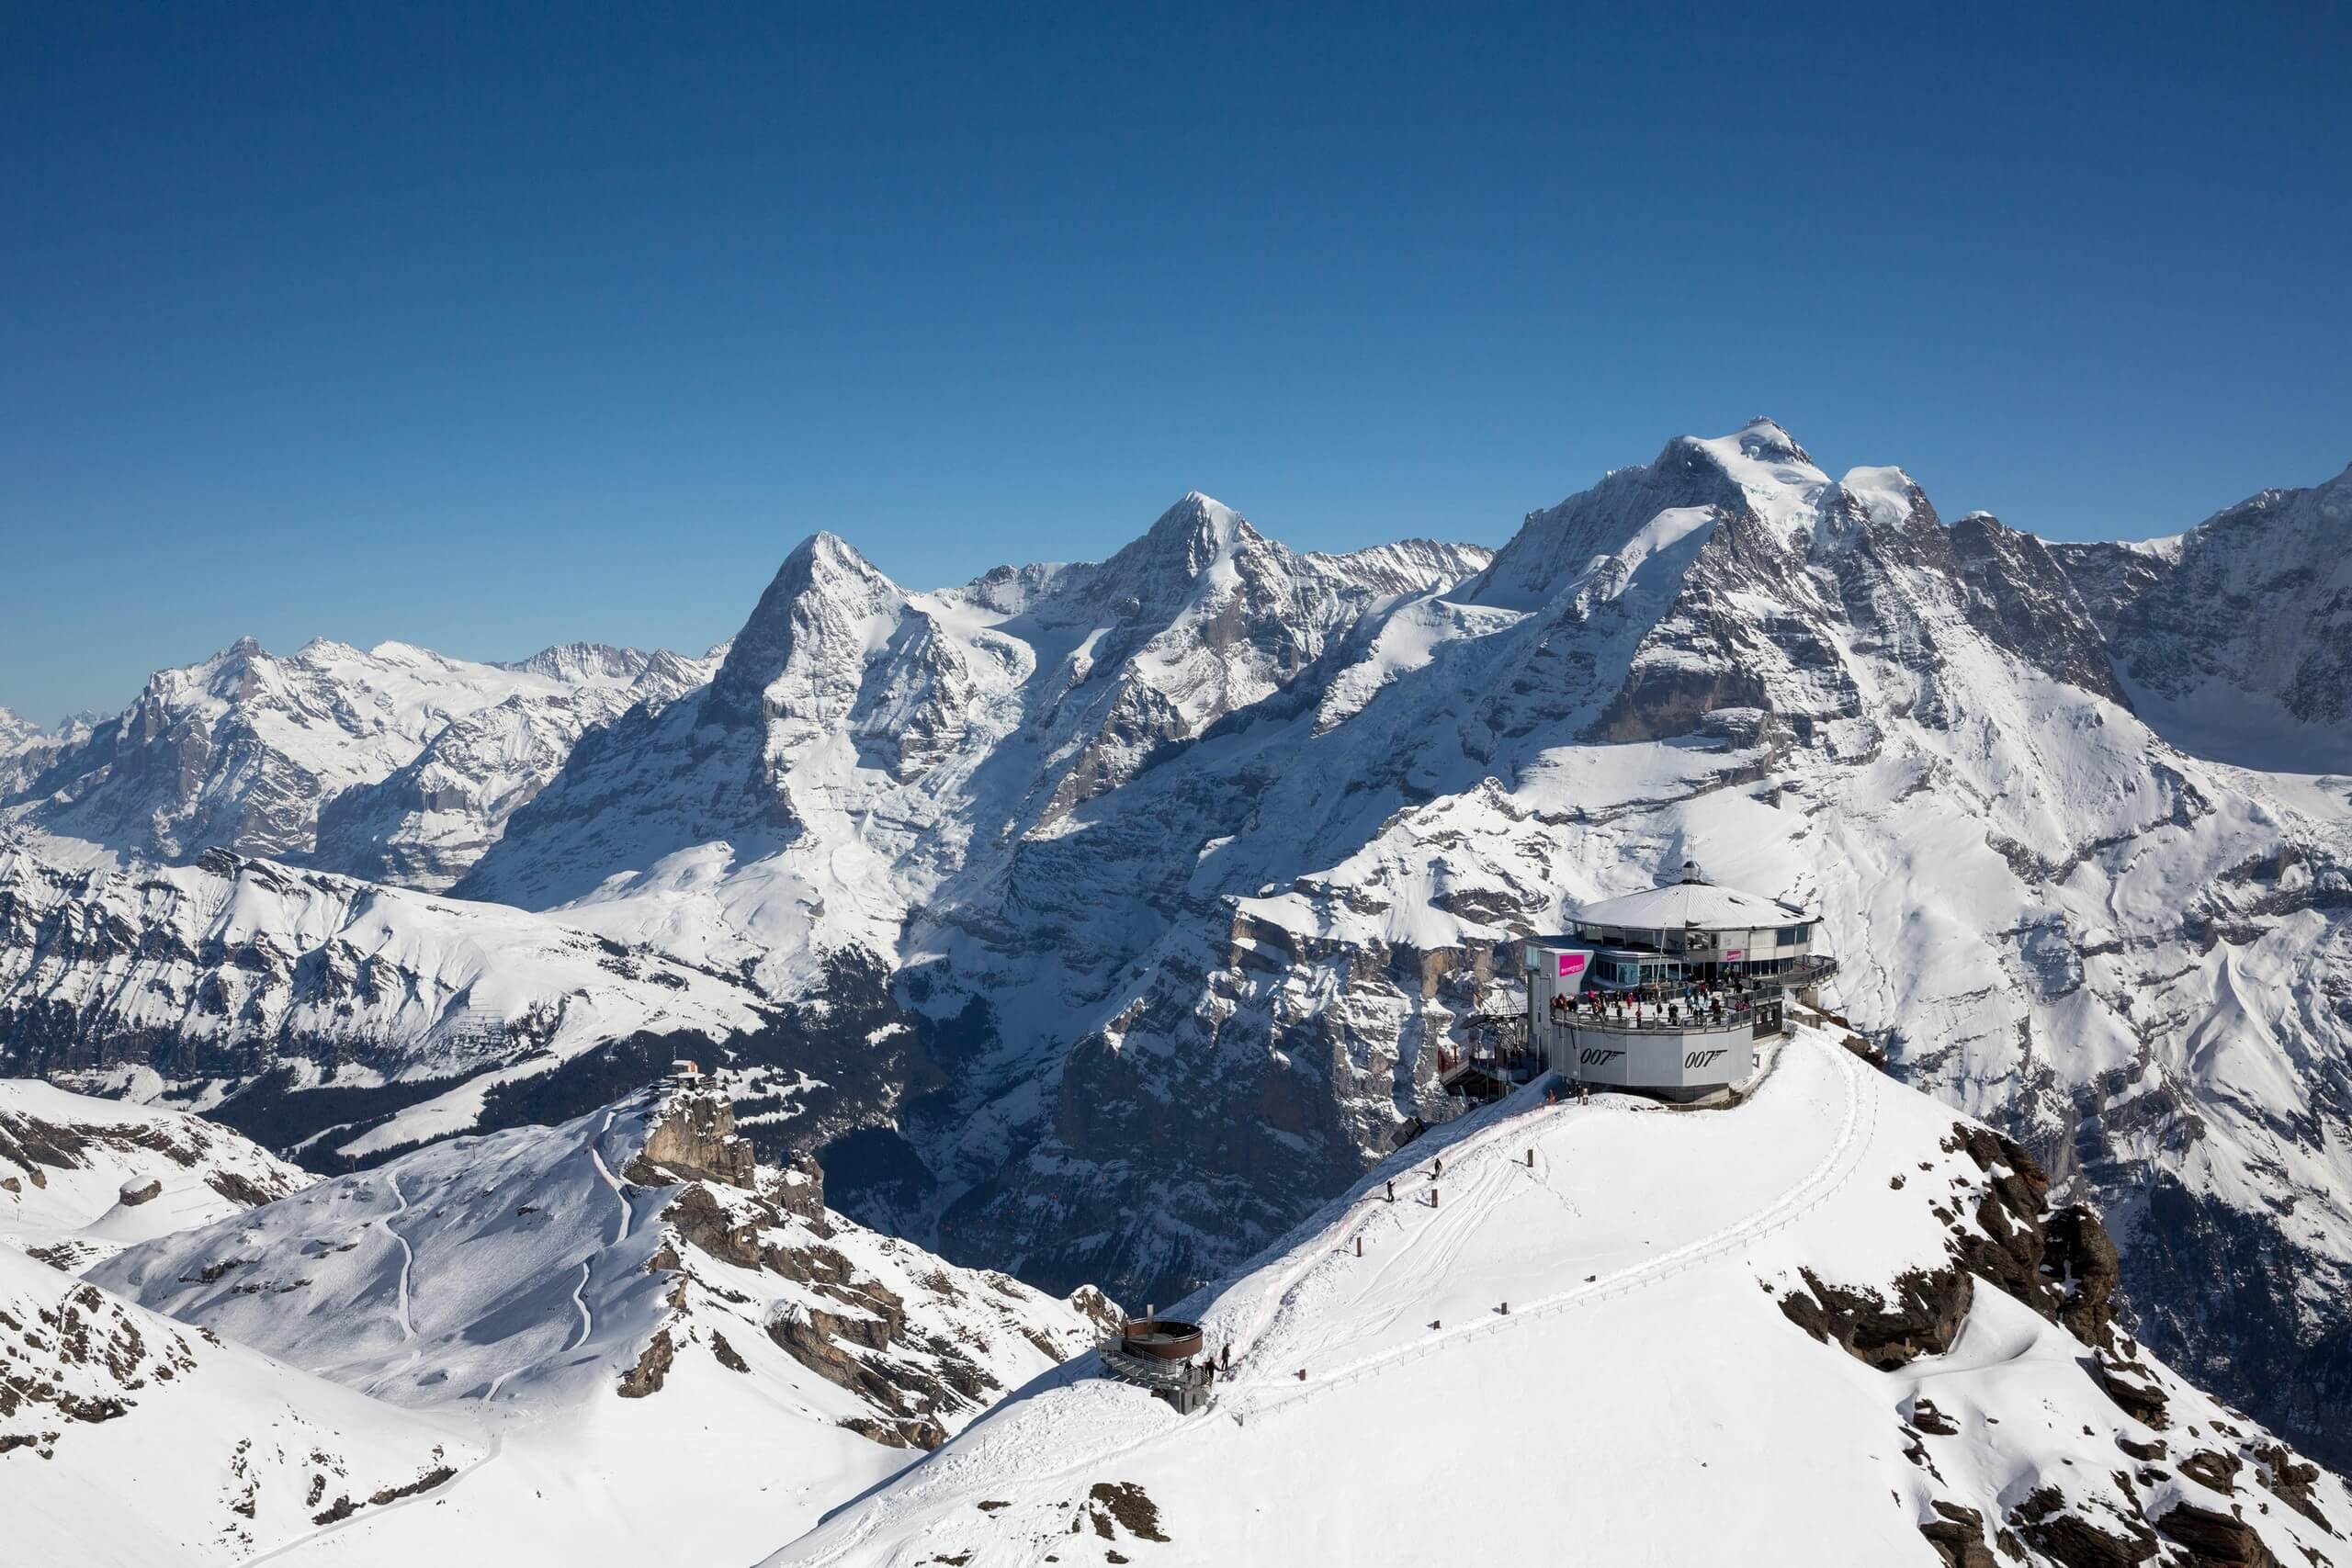 schilthorn-piz-gloria-schnee-panorama